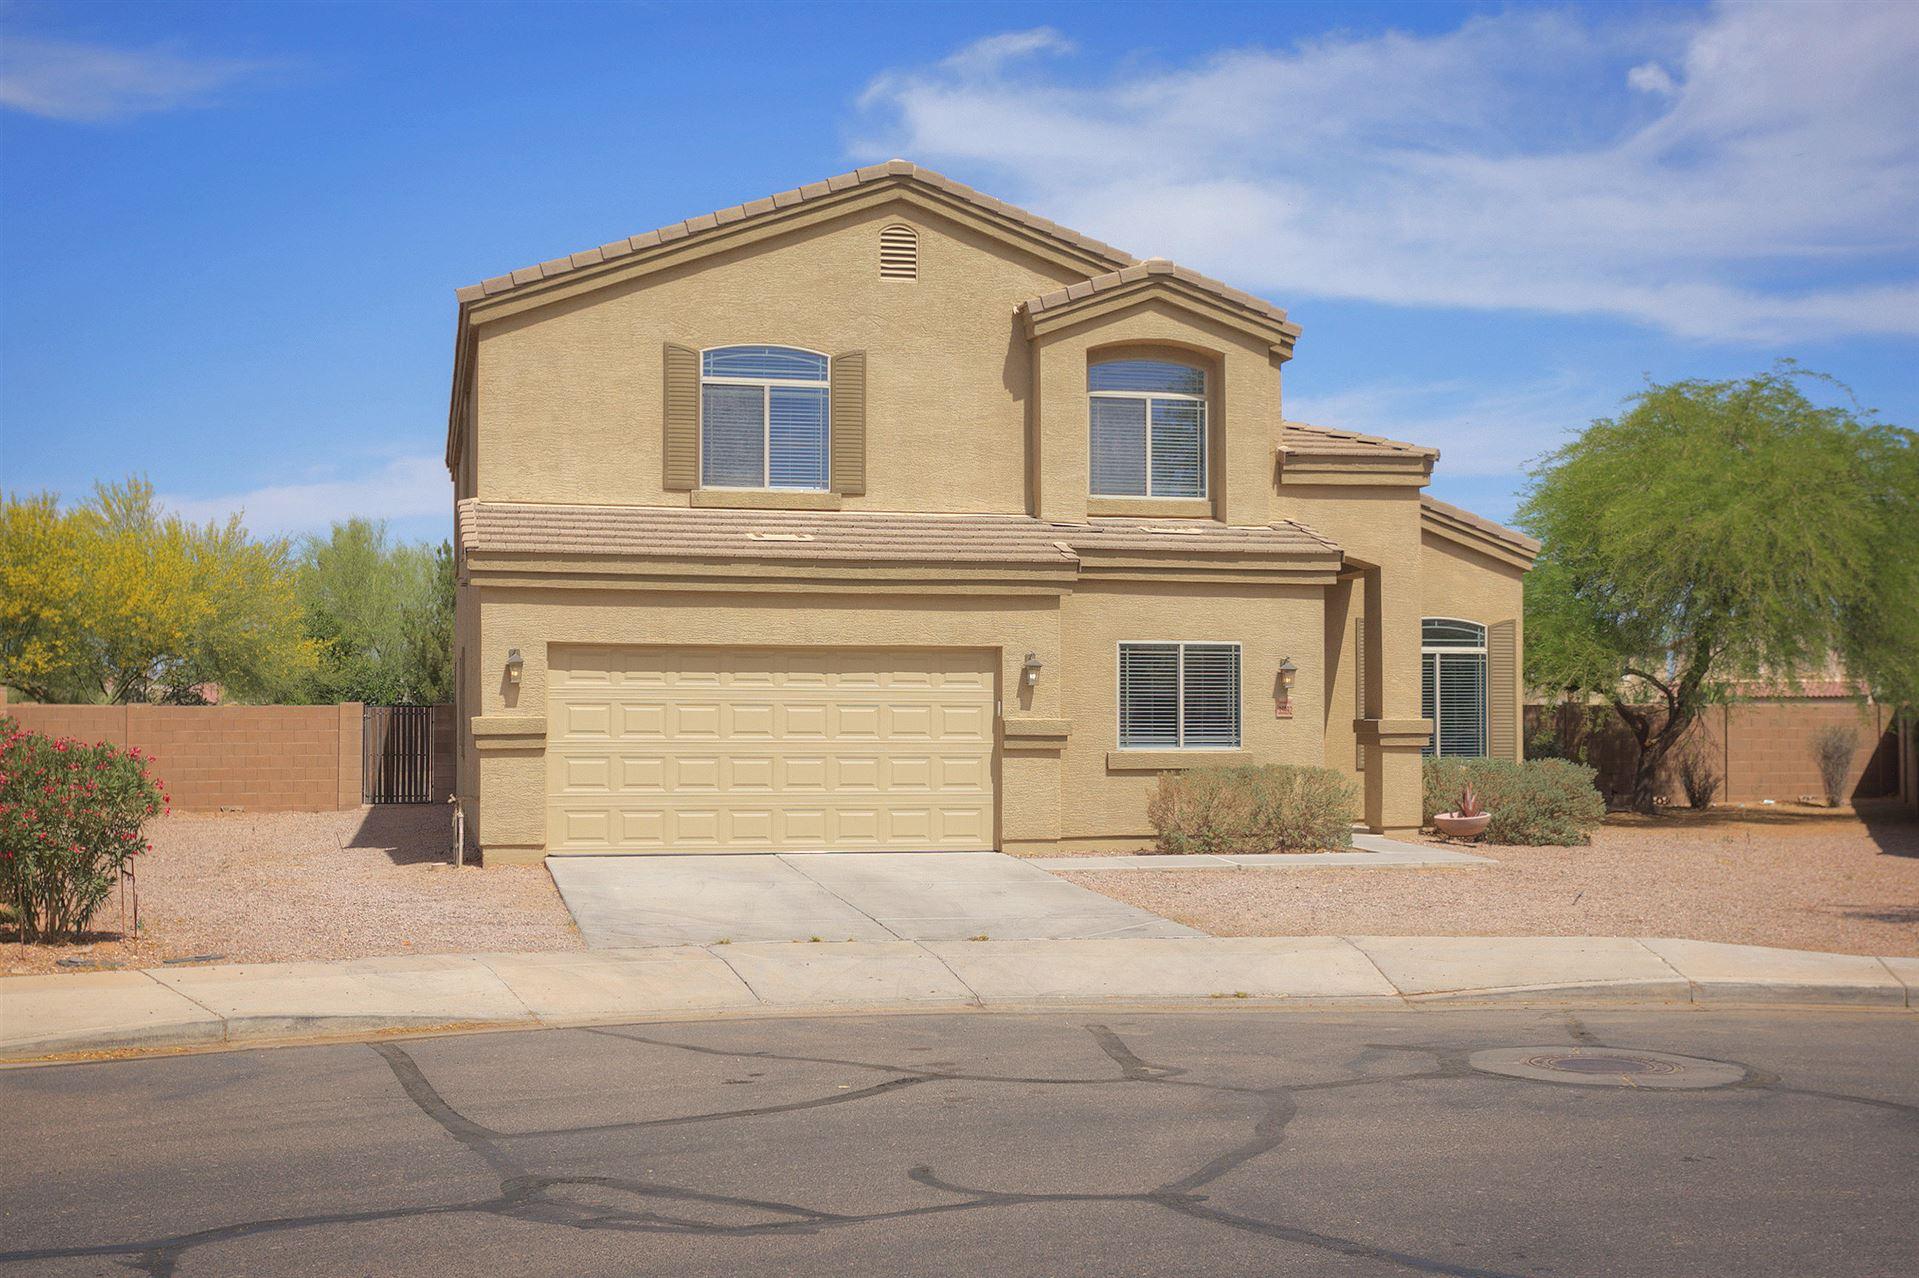 Photo of 35992 W MERCED Street, Maricopa, AZ 85138 (MLS # 6231835)